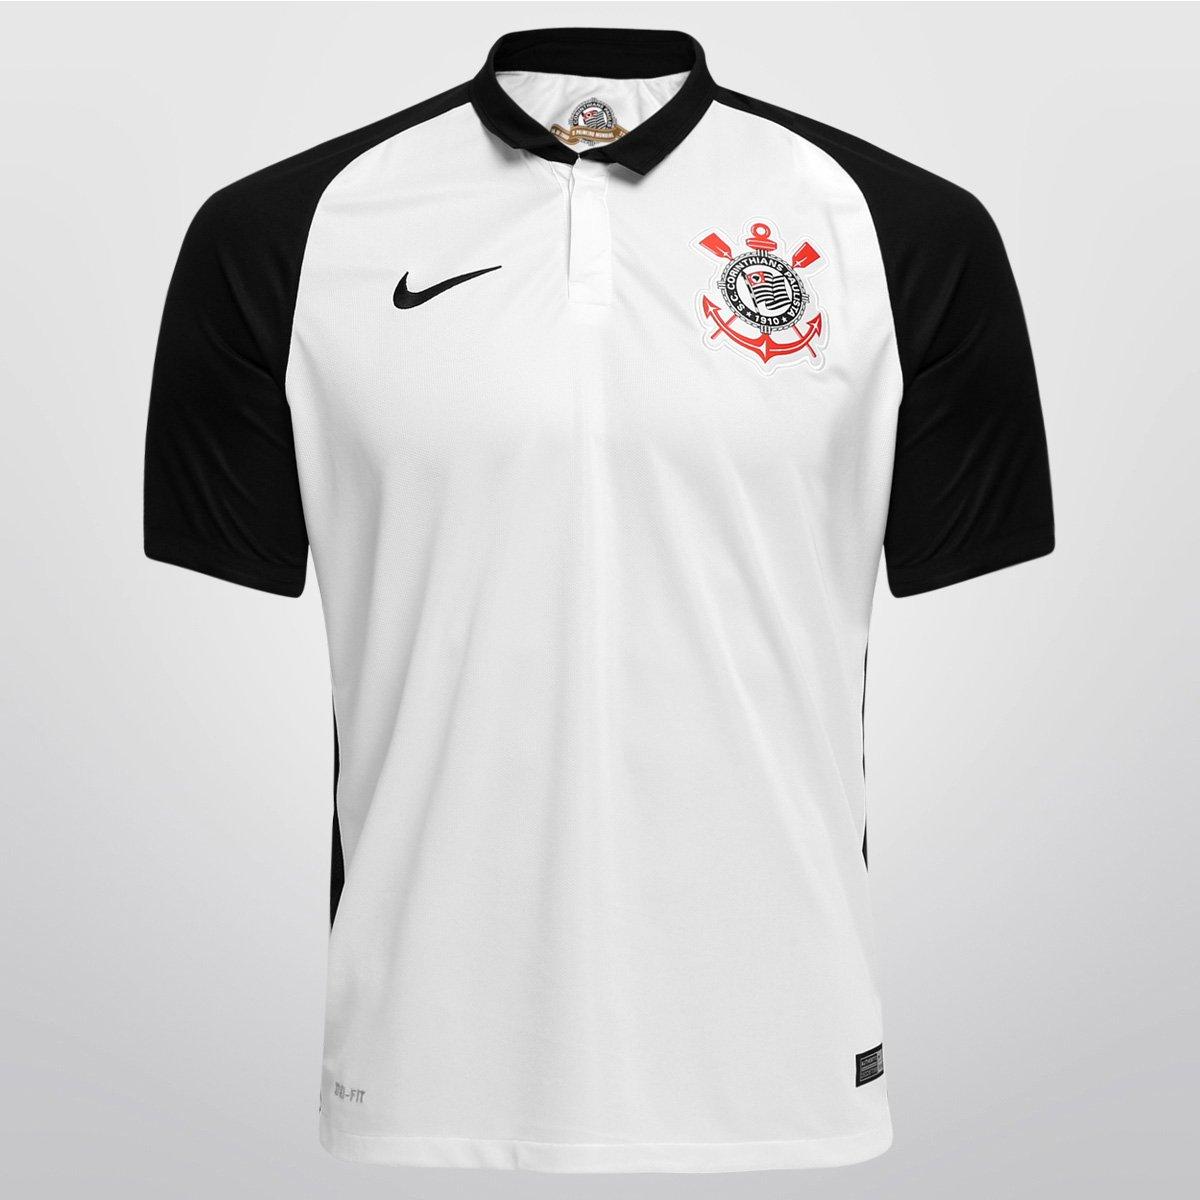 Camisa Corinthians I 15 16 s nº - Torcedor Nike Masculina - Compre ... a7c79188273cd